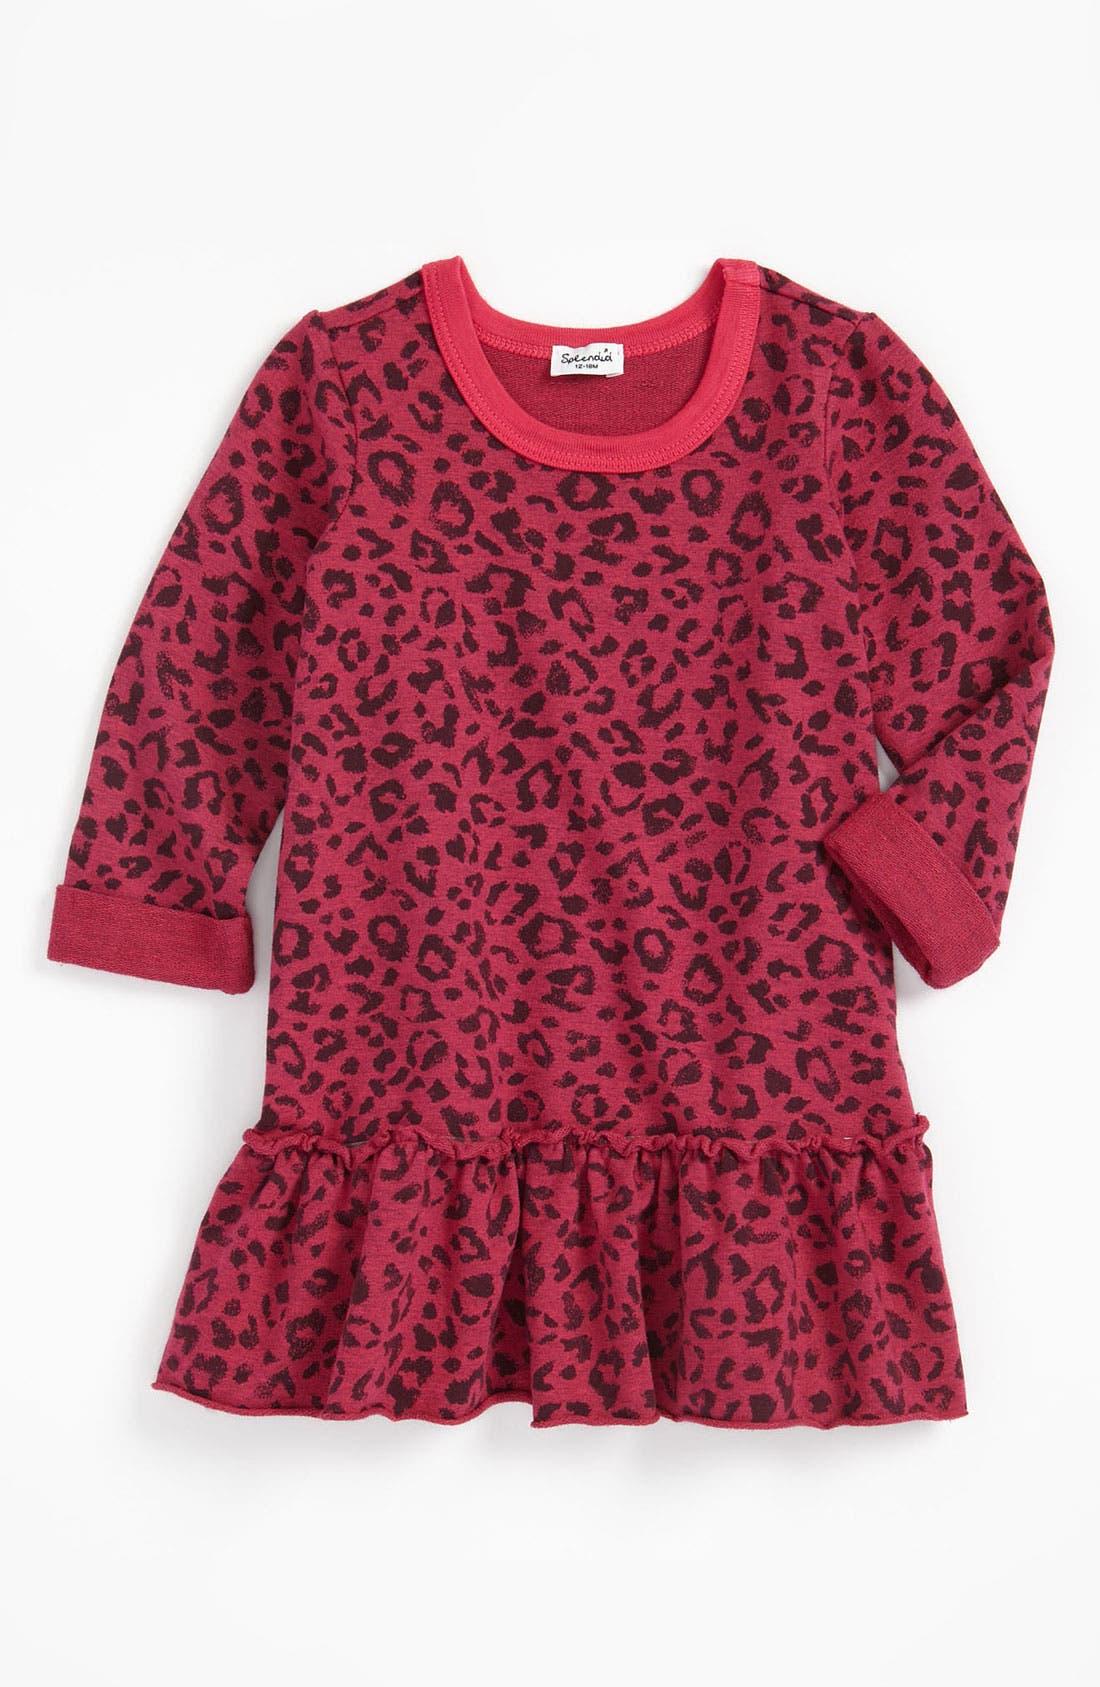 Main Image - Splendid Leopard Print Dress (Toddler)